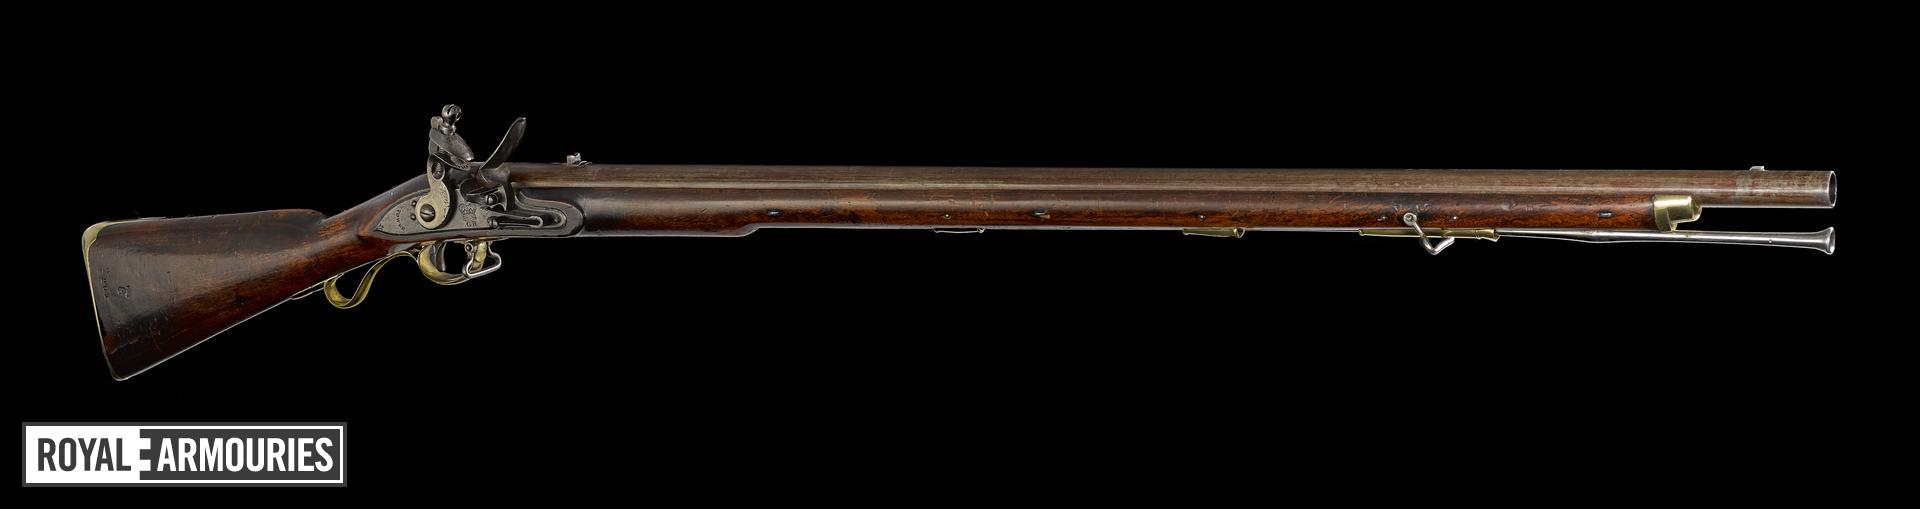 Flintlock muzzle-loading military musket - Model1805 New Land Light Infantry Pattern